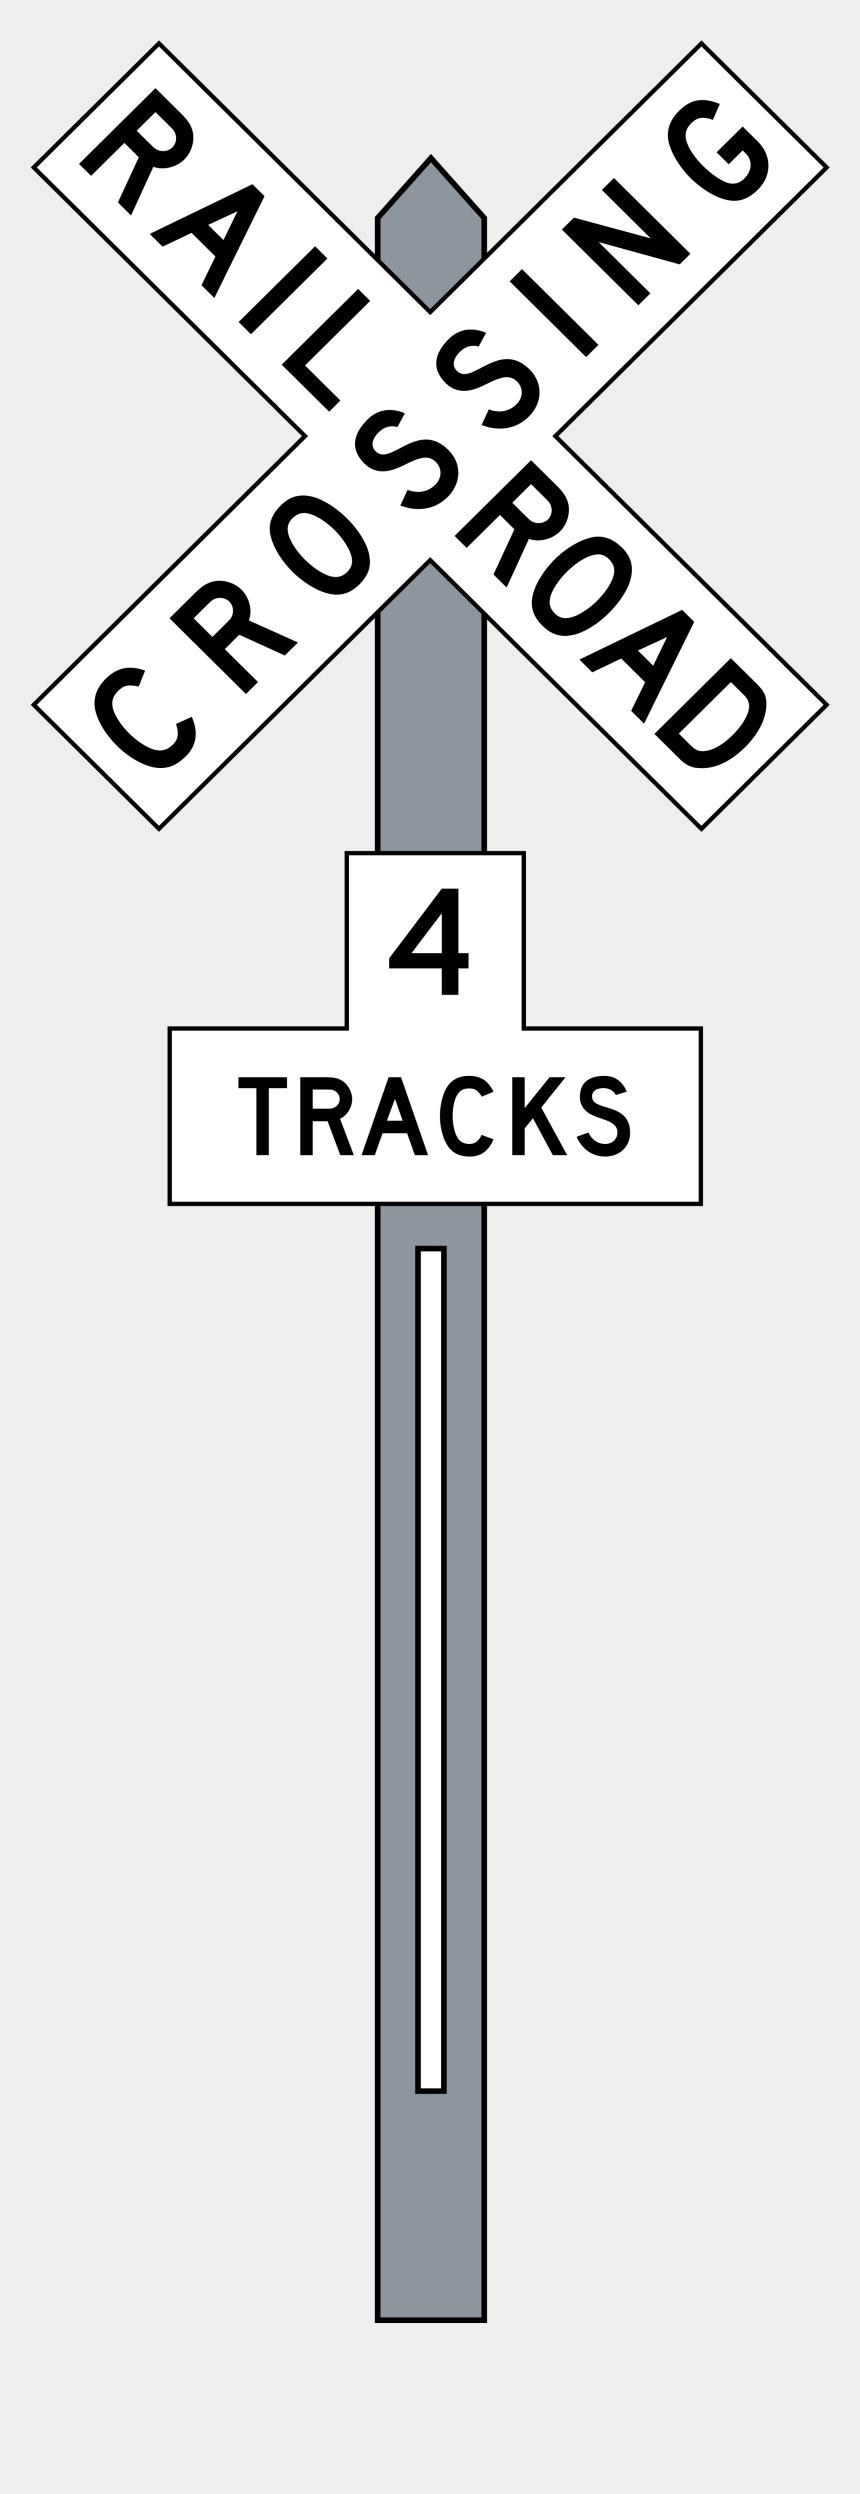 railroad track clipart, Cartoons - Railroad Tracks Transparent Background Png Images - Railroad Crossing 4 Tracks